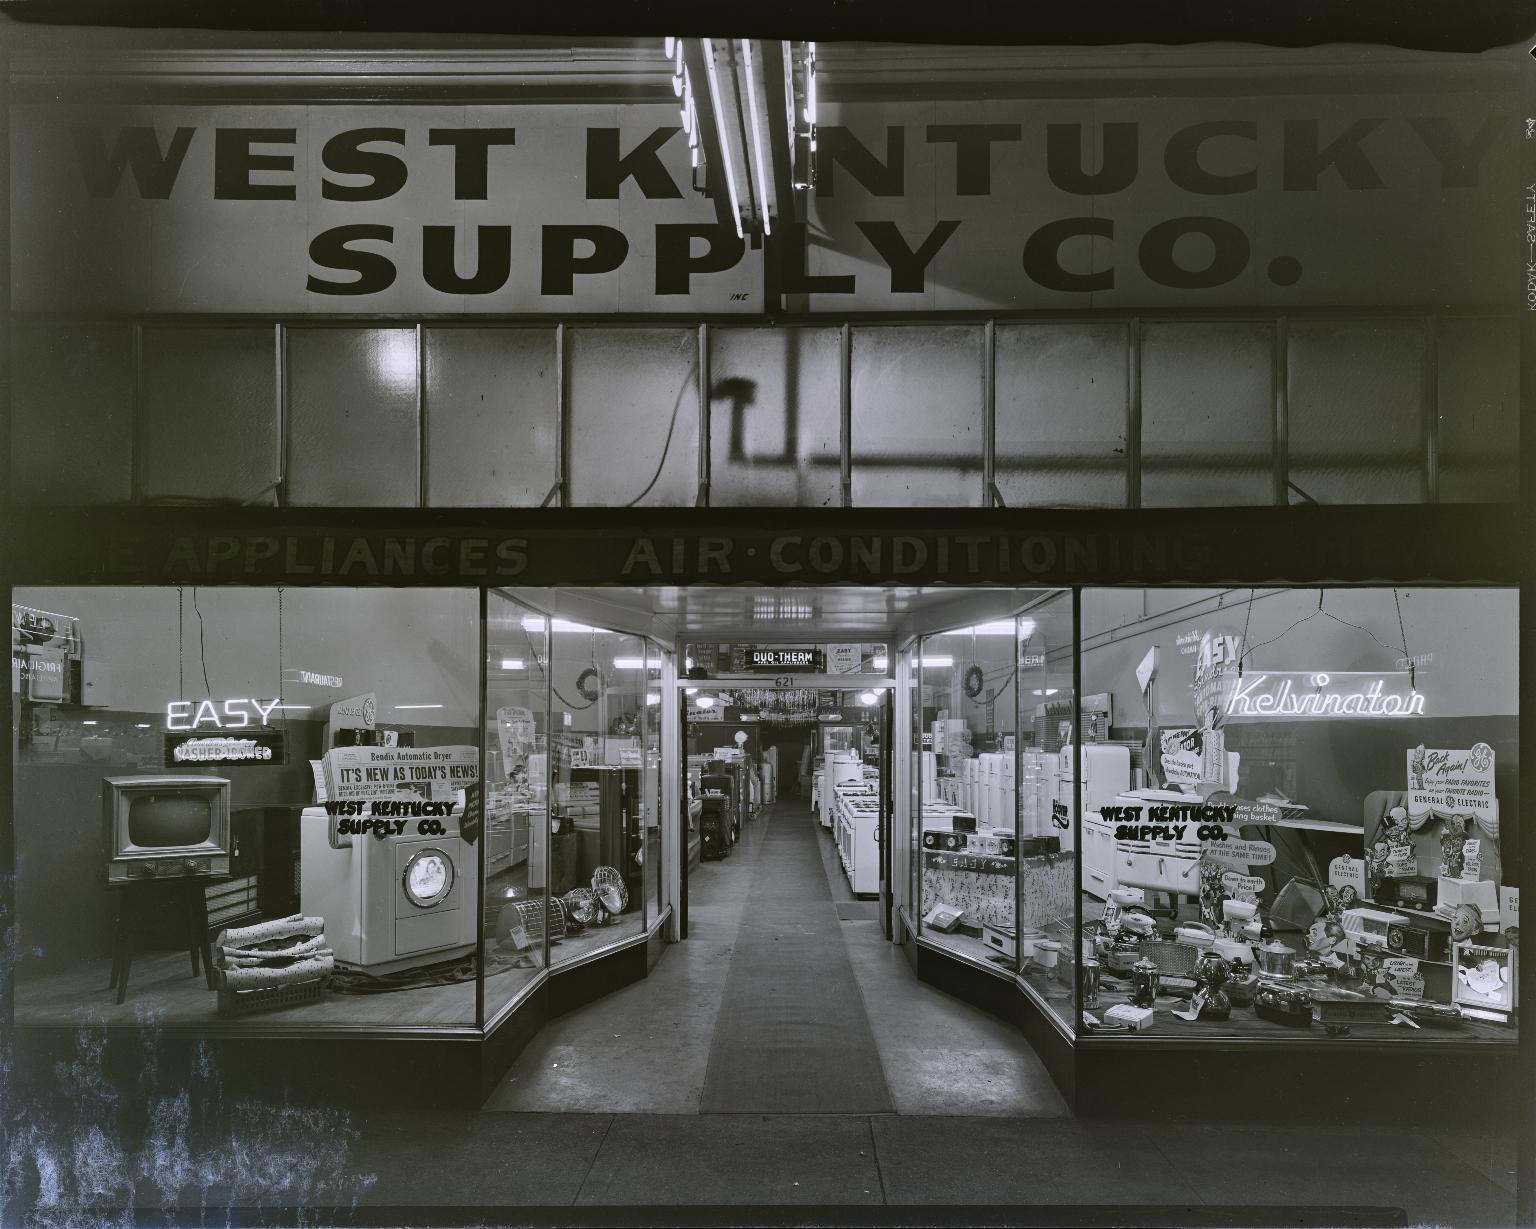 West Kentucky Supply Company